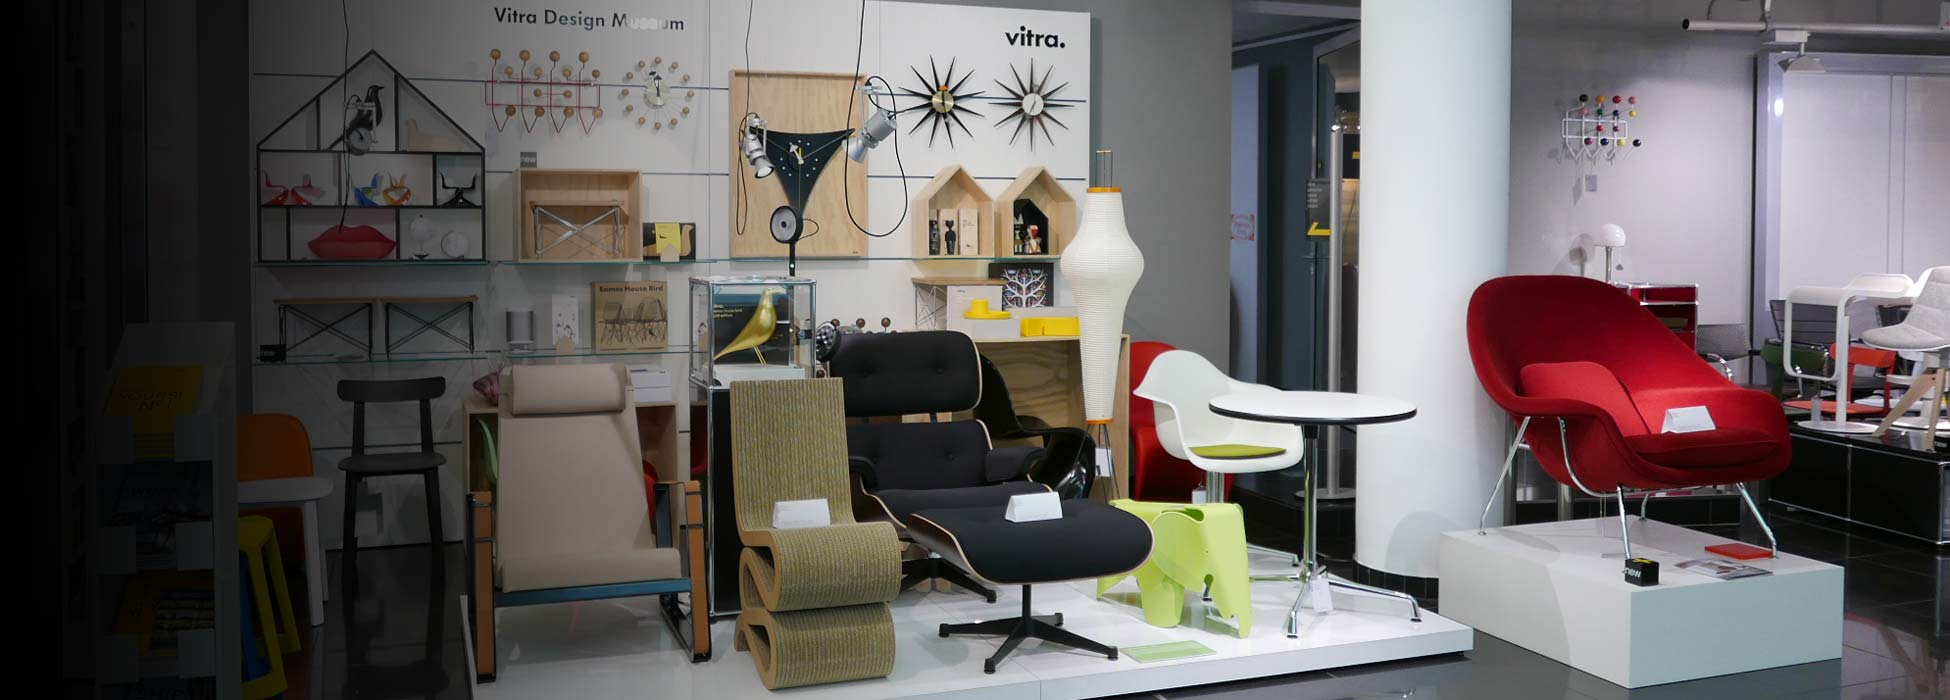 vitra shop bei steidten+ berlin